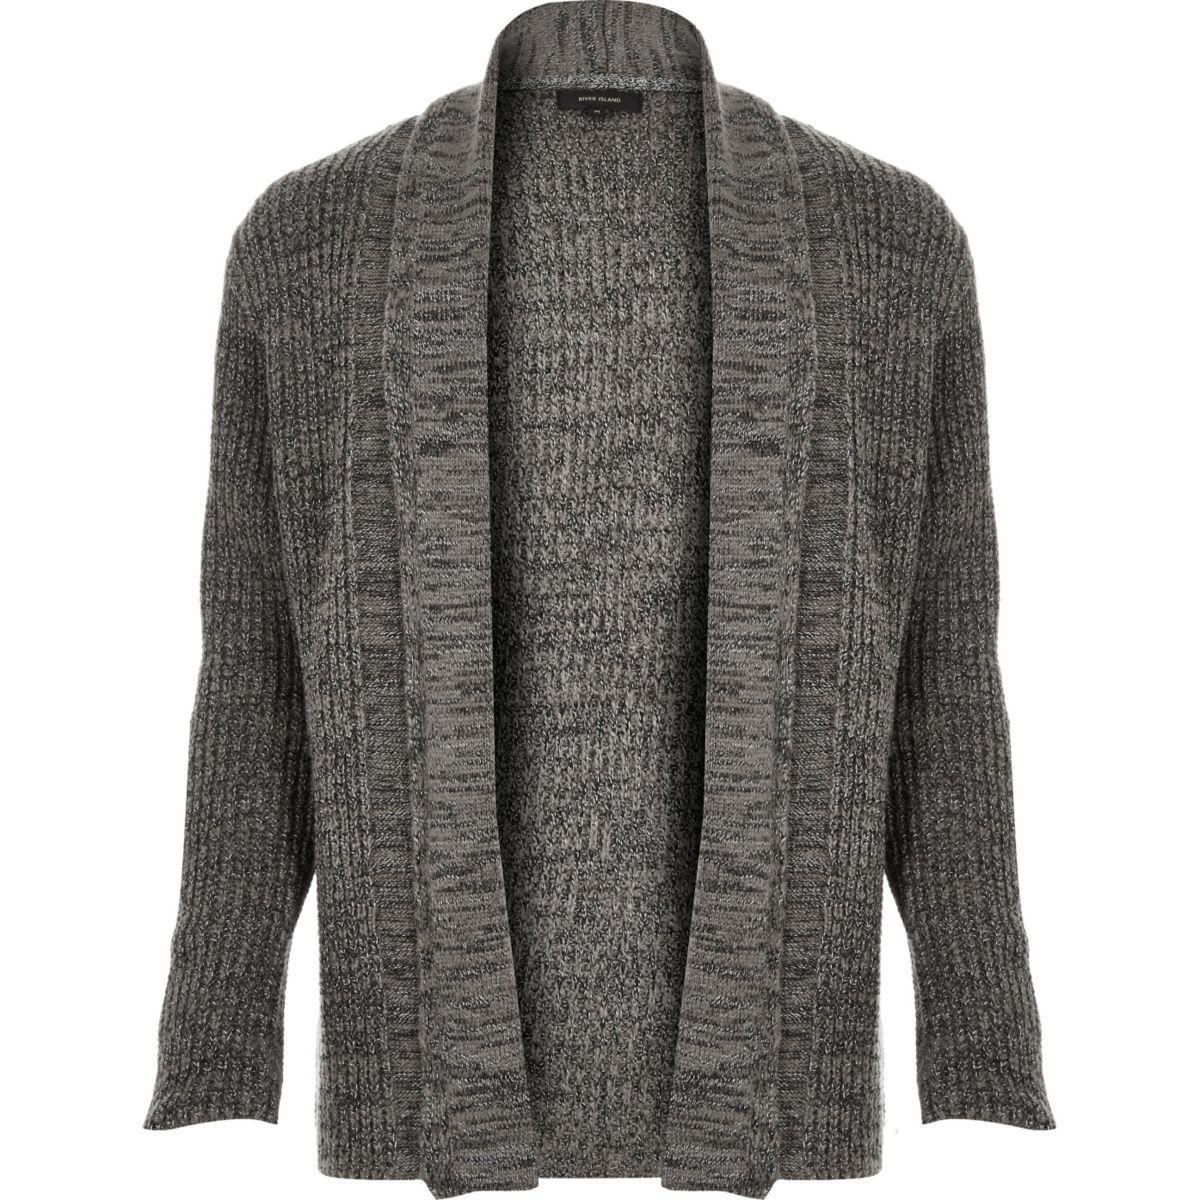 Grey textured open front cardigan